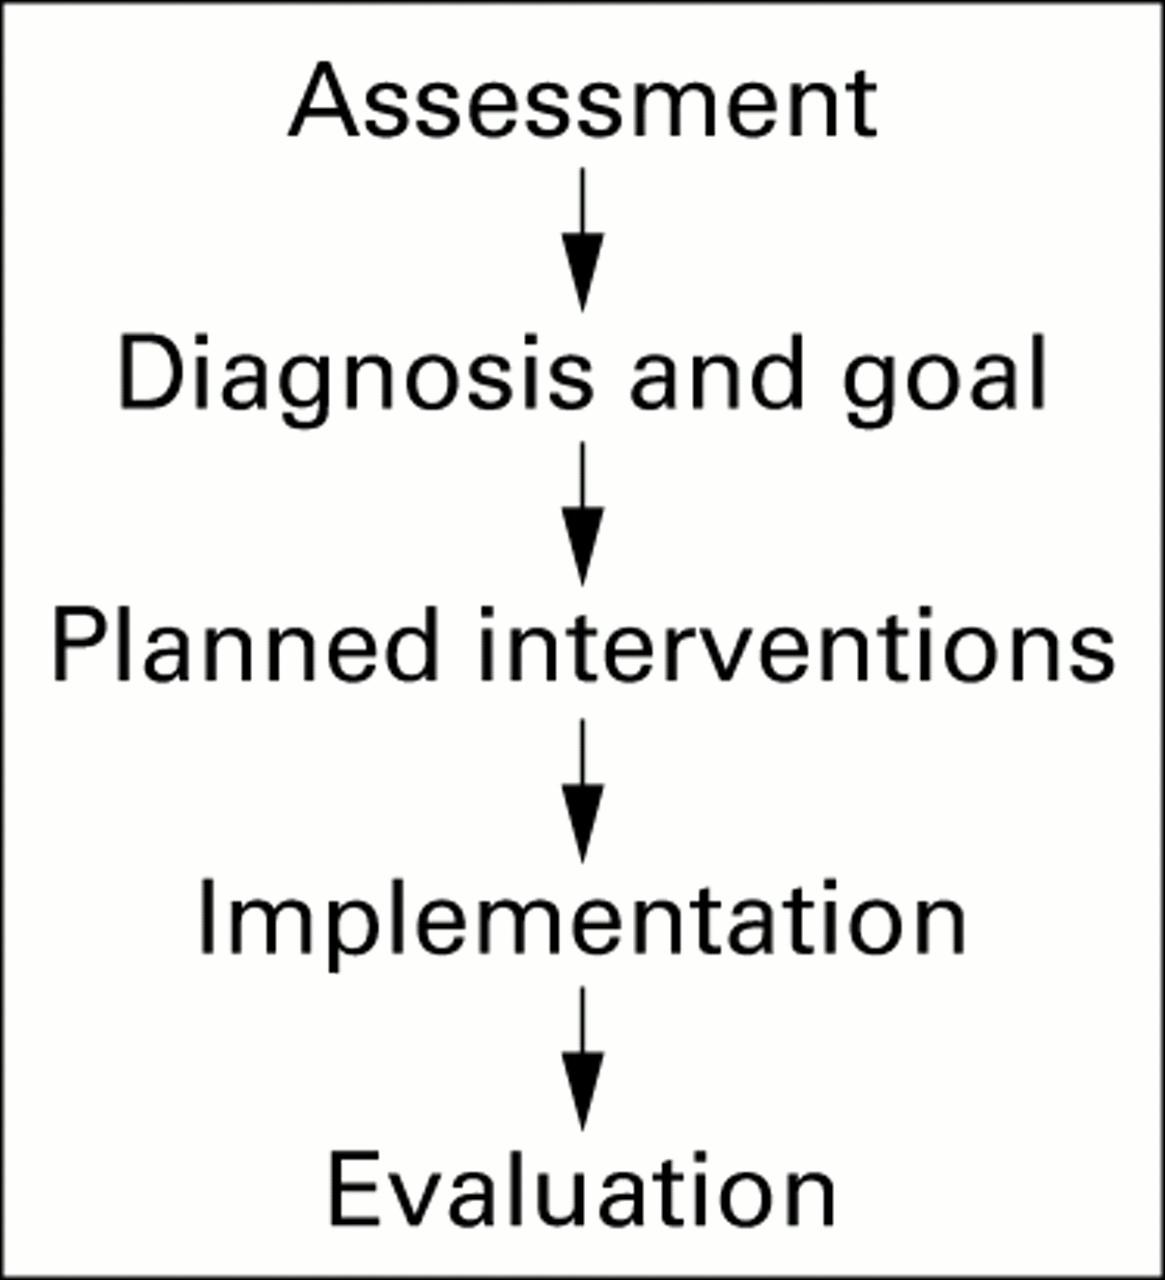 Development of an audit instrument for nursing care plans